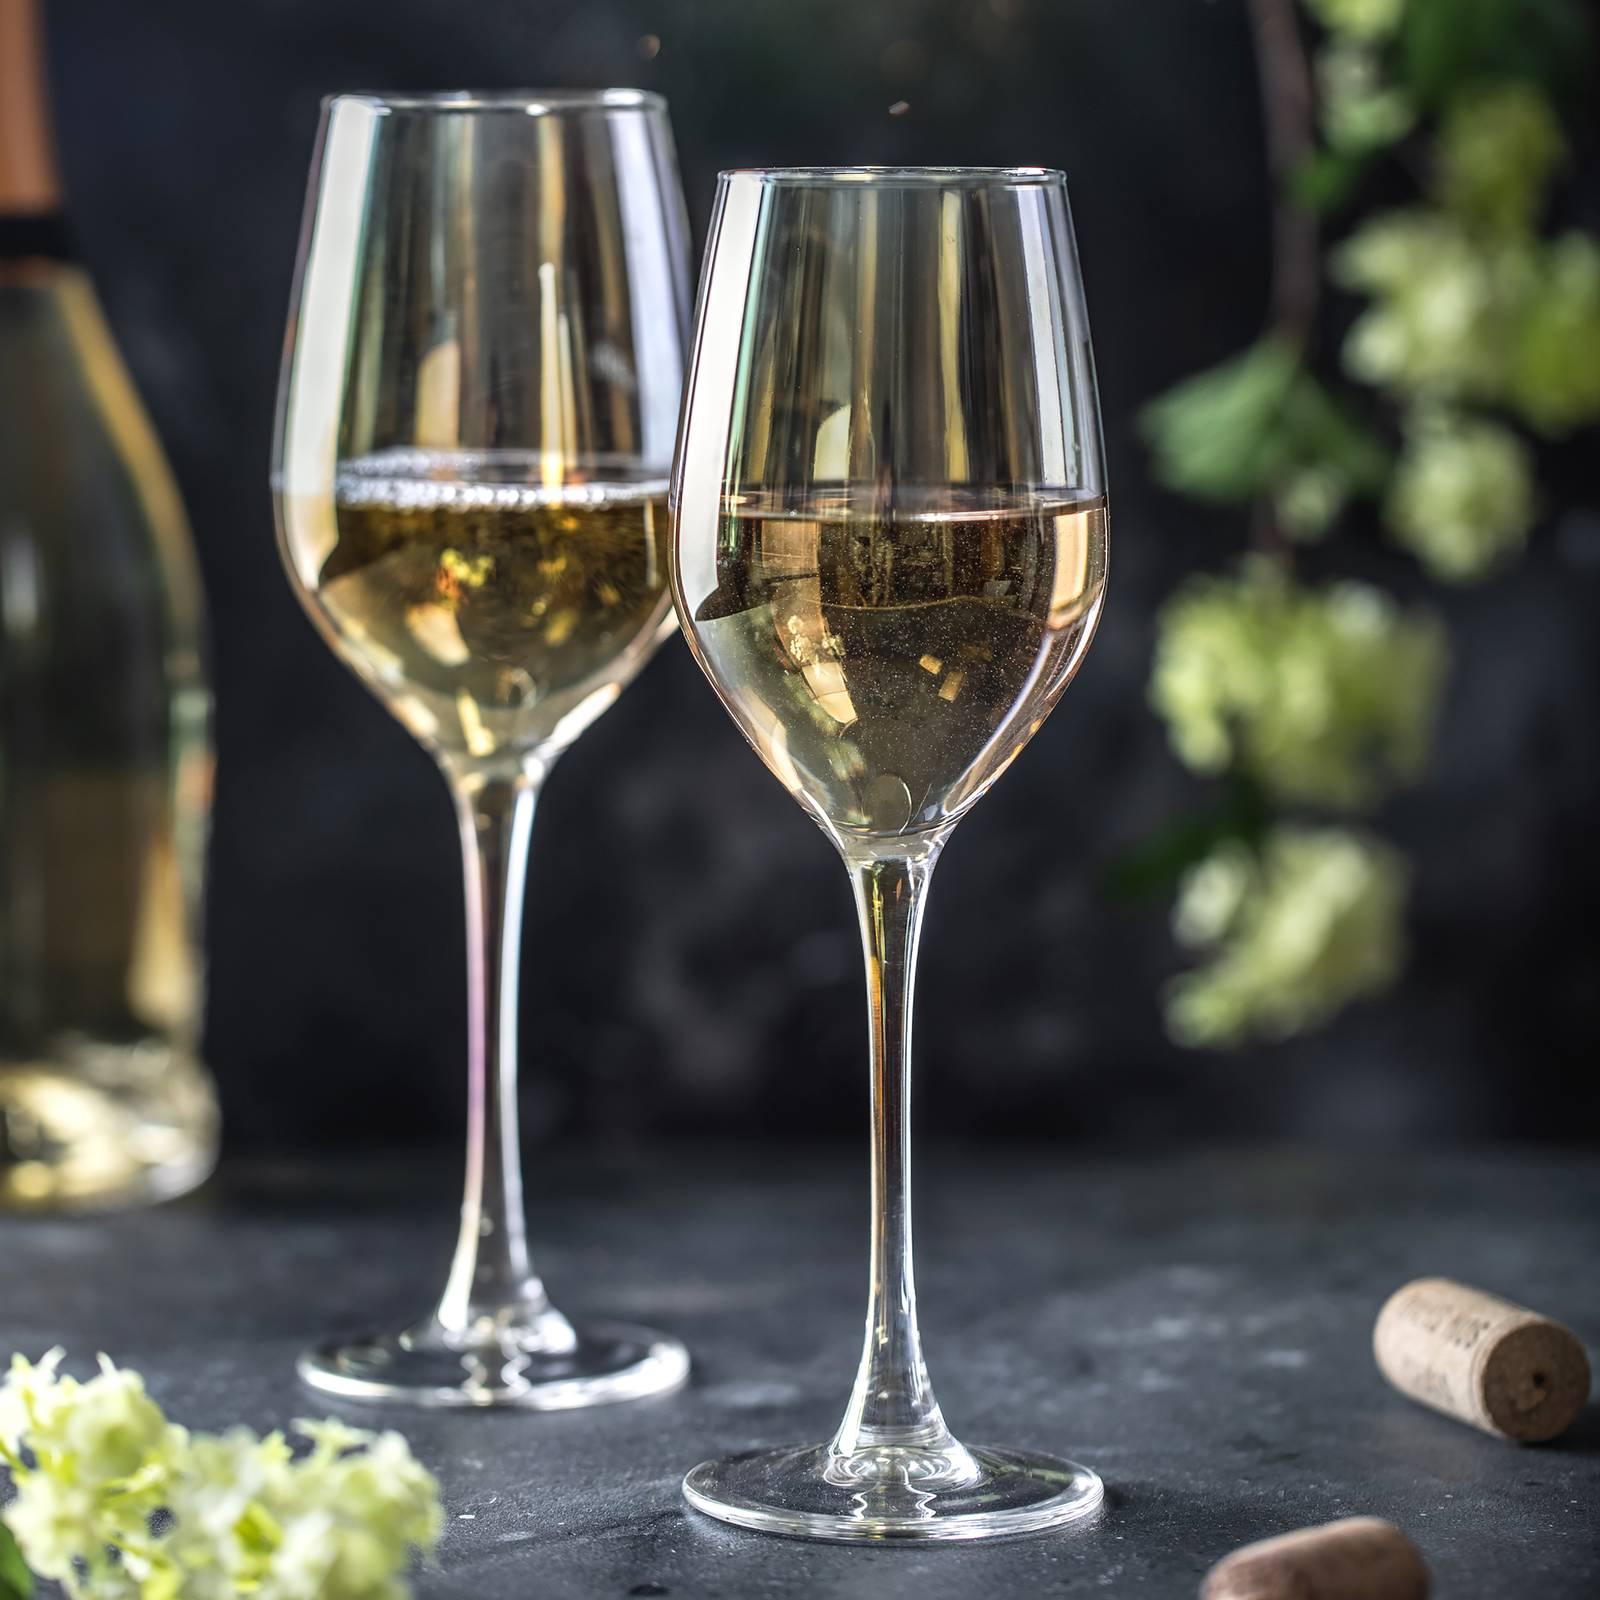 Komplet 6 kieliszków do wina Celeste Golden Chameleon 270 ml LUMINARC